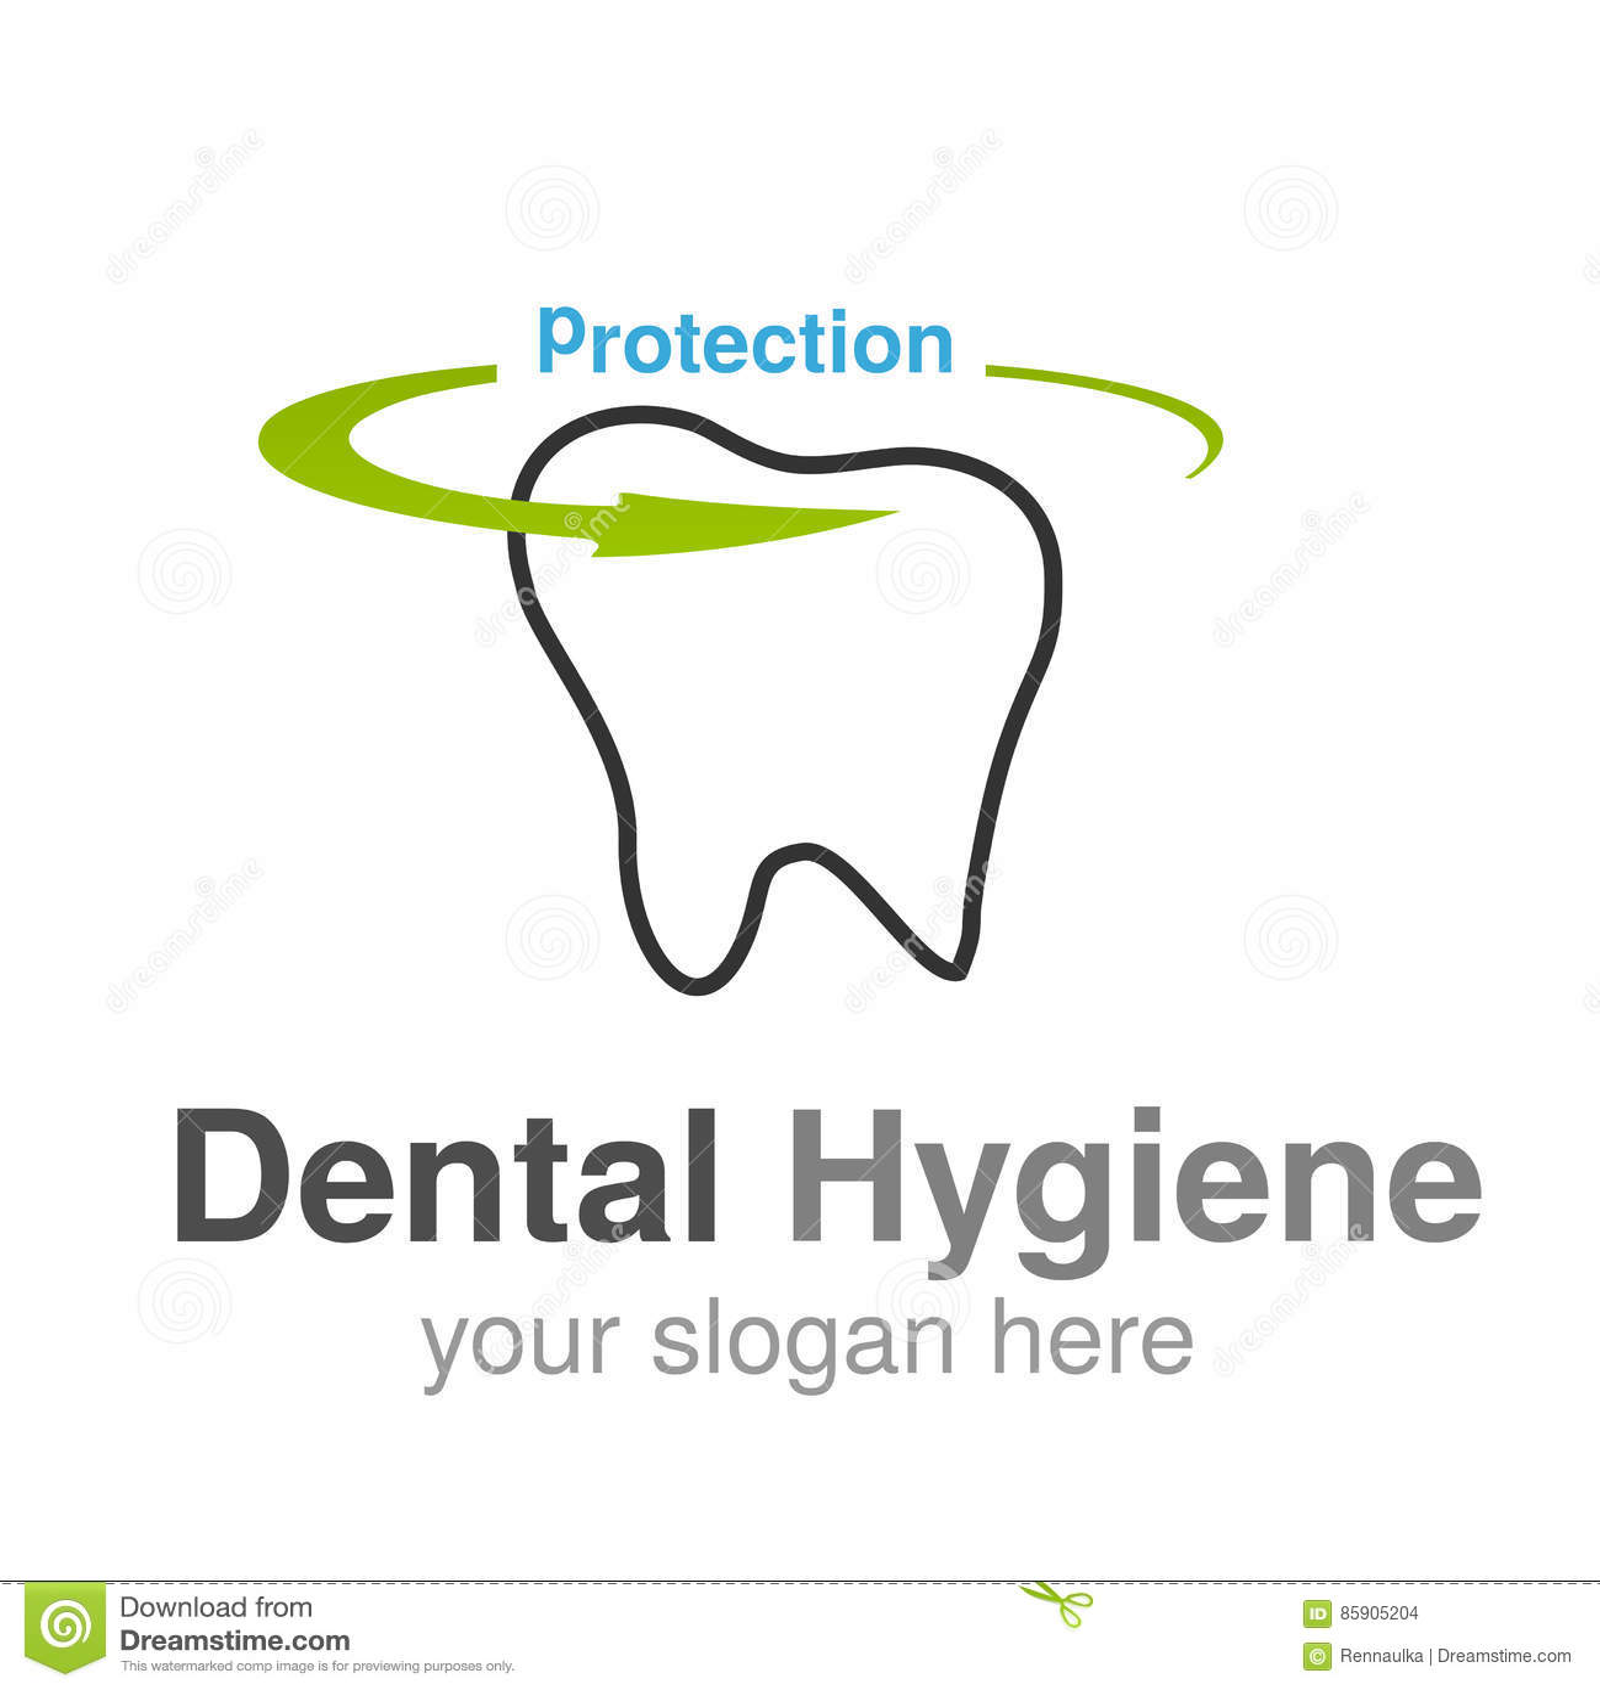 Dentist logo design template tooth line symbol for dental clinic or dentist logo design template tooth line symbol for dental clinic or mark for dental hygiene maxwellsz